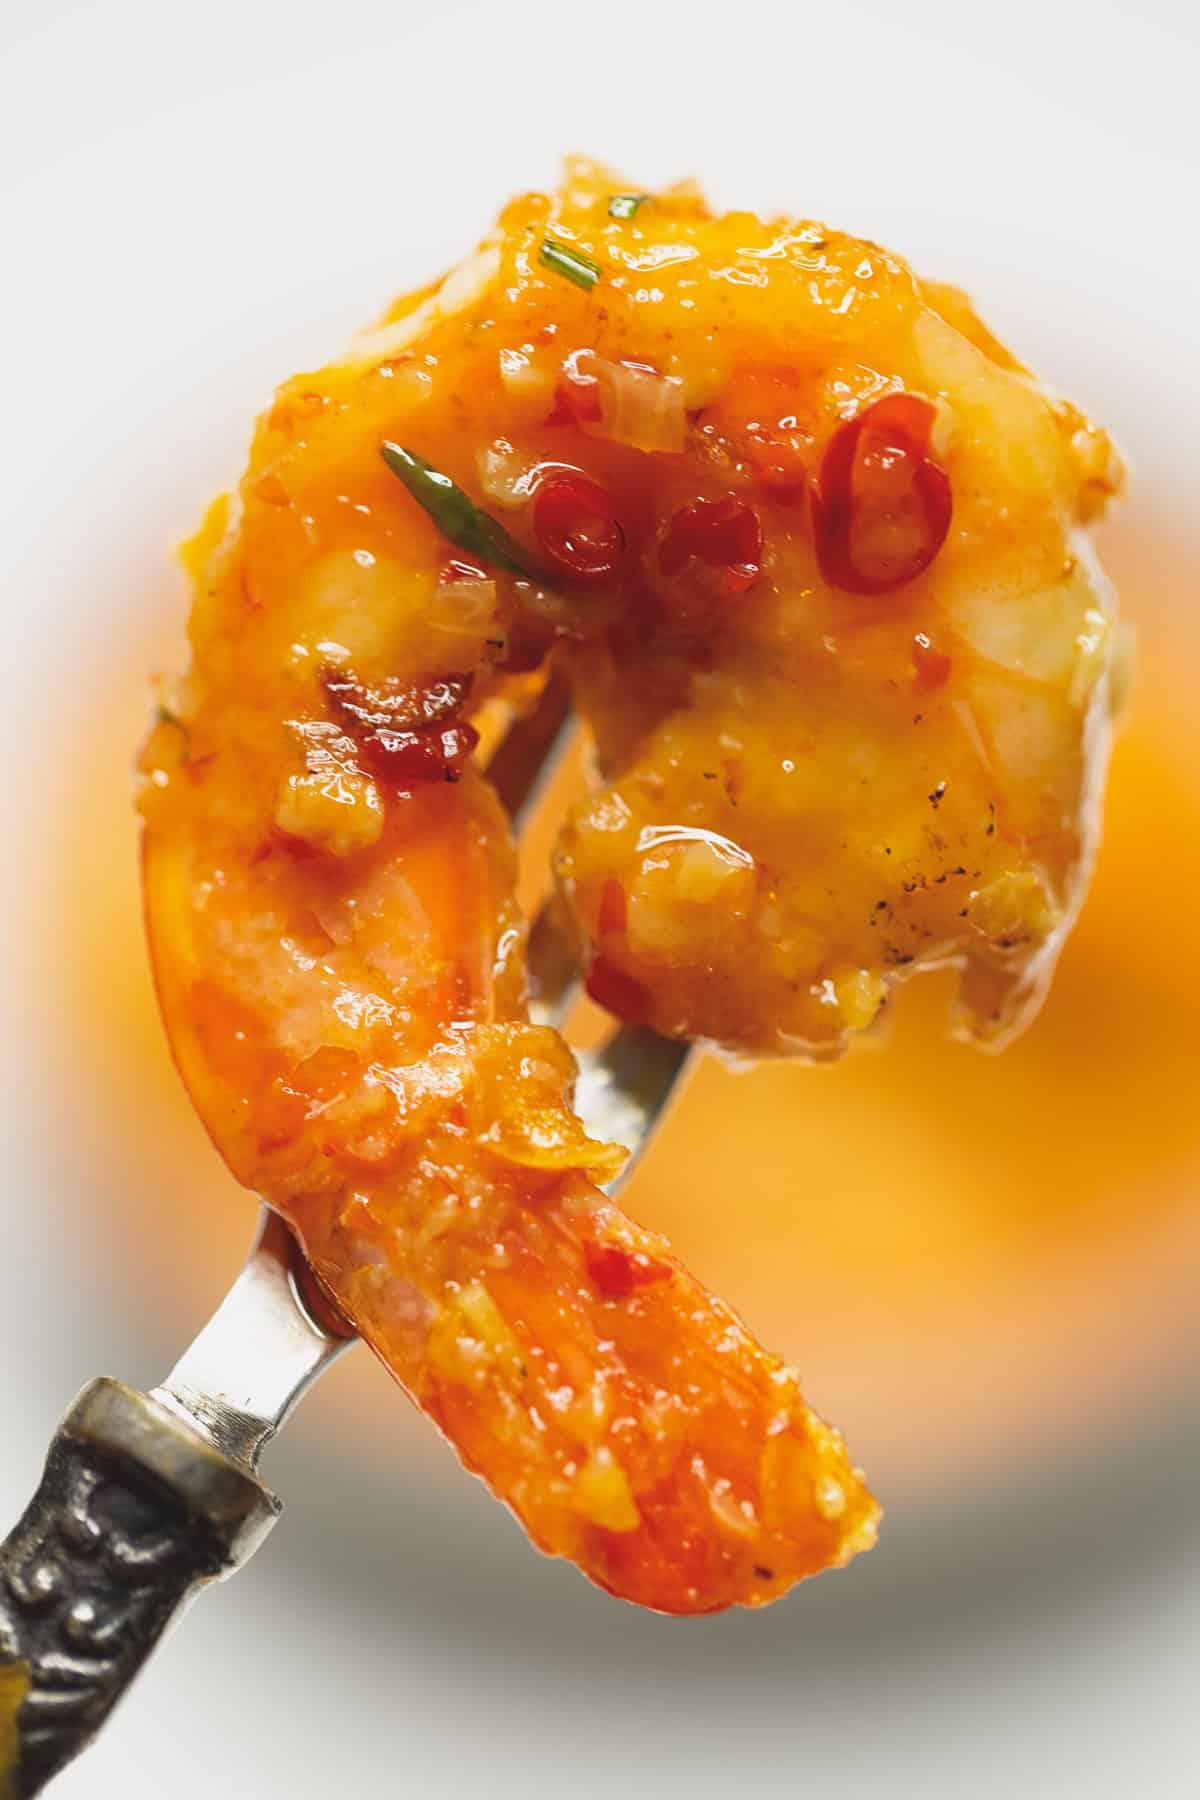 saucy piece of shrimp on a fork